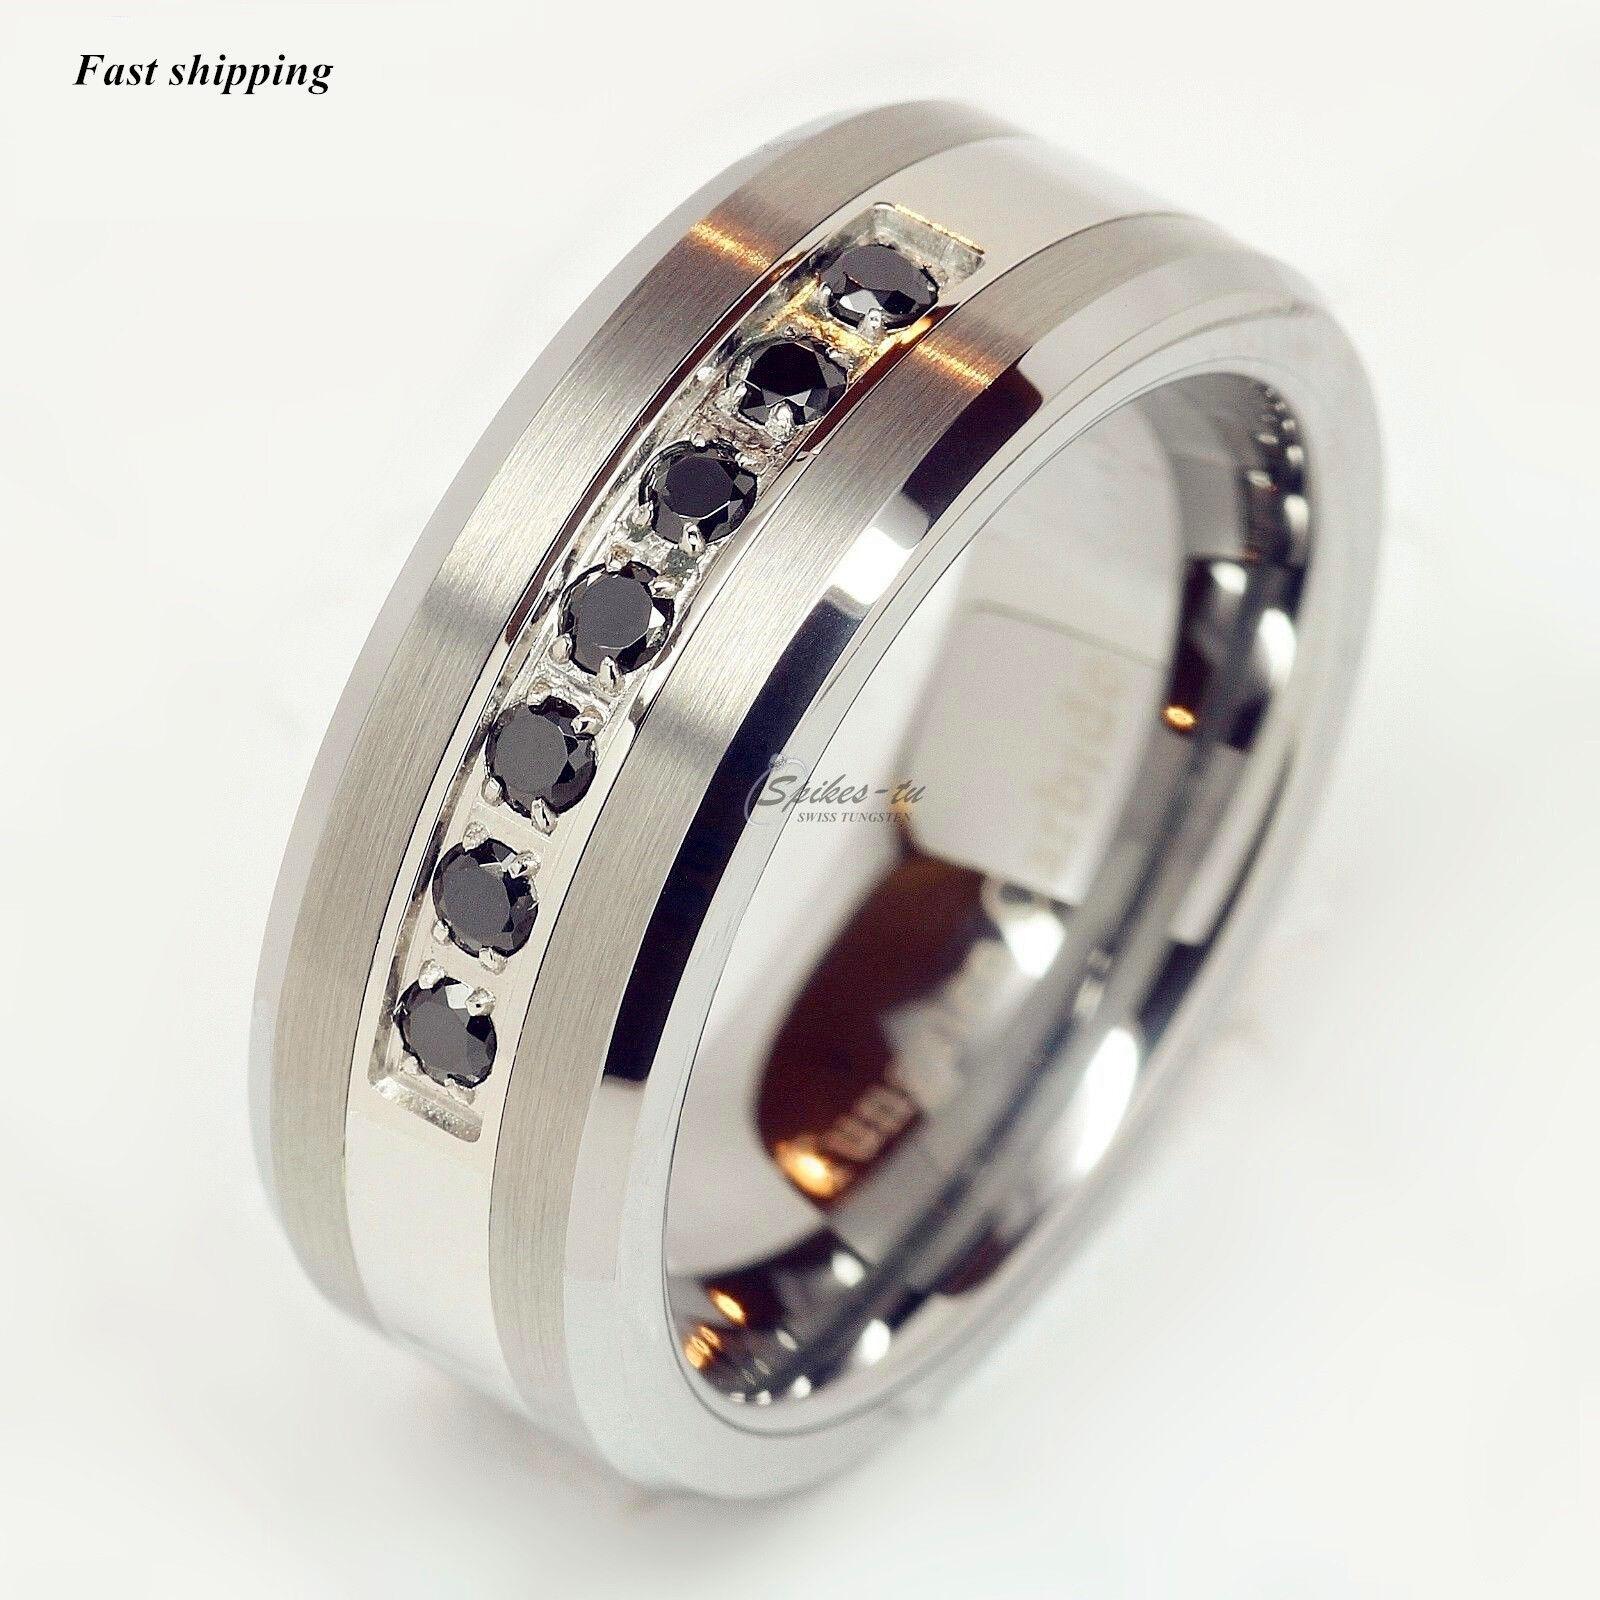 luxury best Tungsten Ring Black Diamonds Mens Wedding Band Brushed size 613  eBay